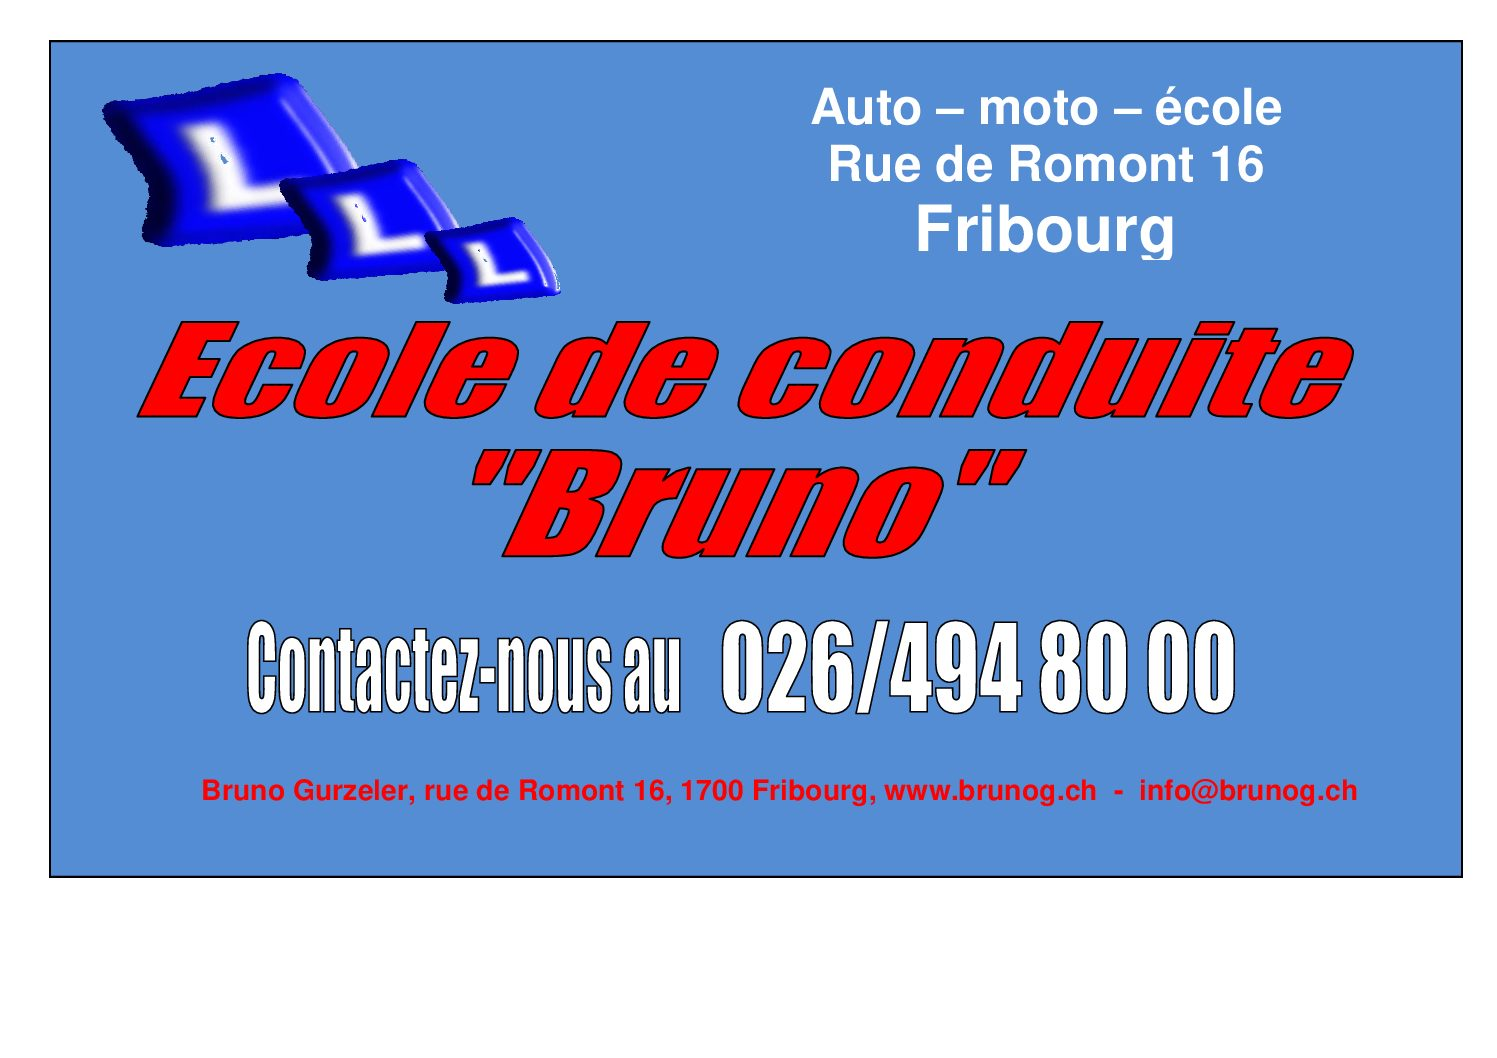 https://www.fcrichemond.ch/wp-content/uploads/2021/07/Annonce-Auto-Ecole-Bruno-pdf.jpg